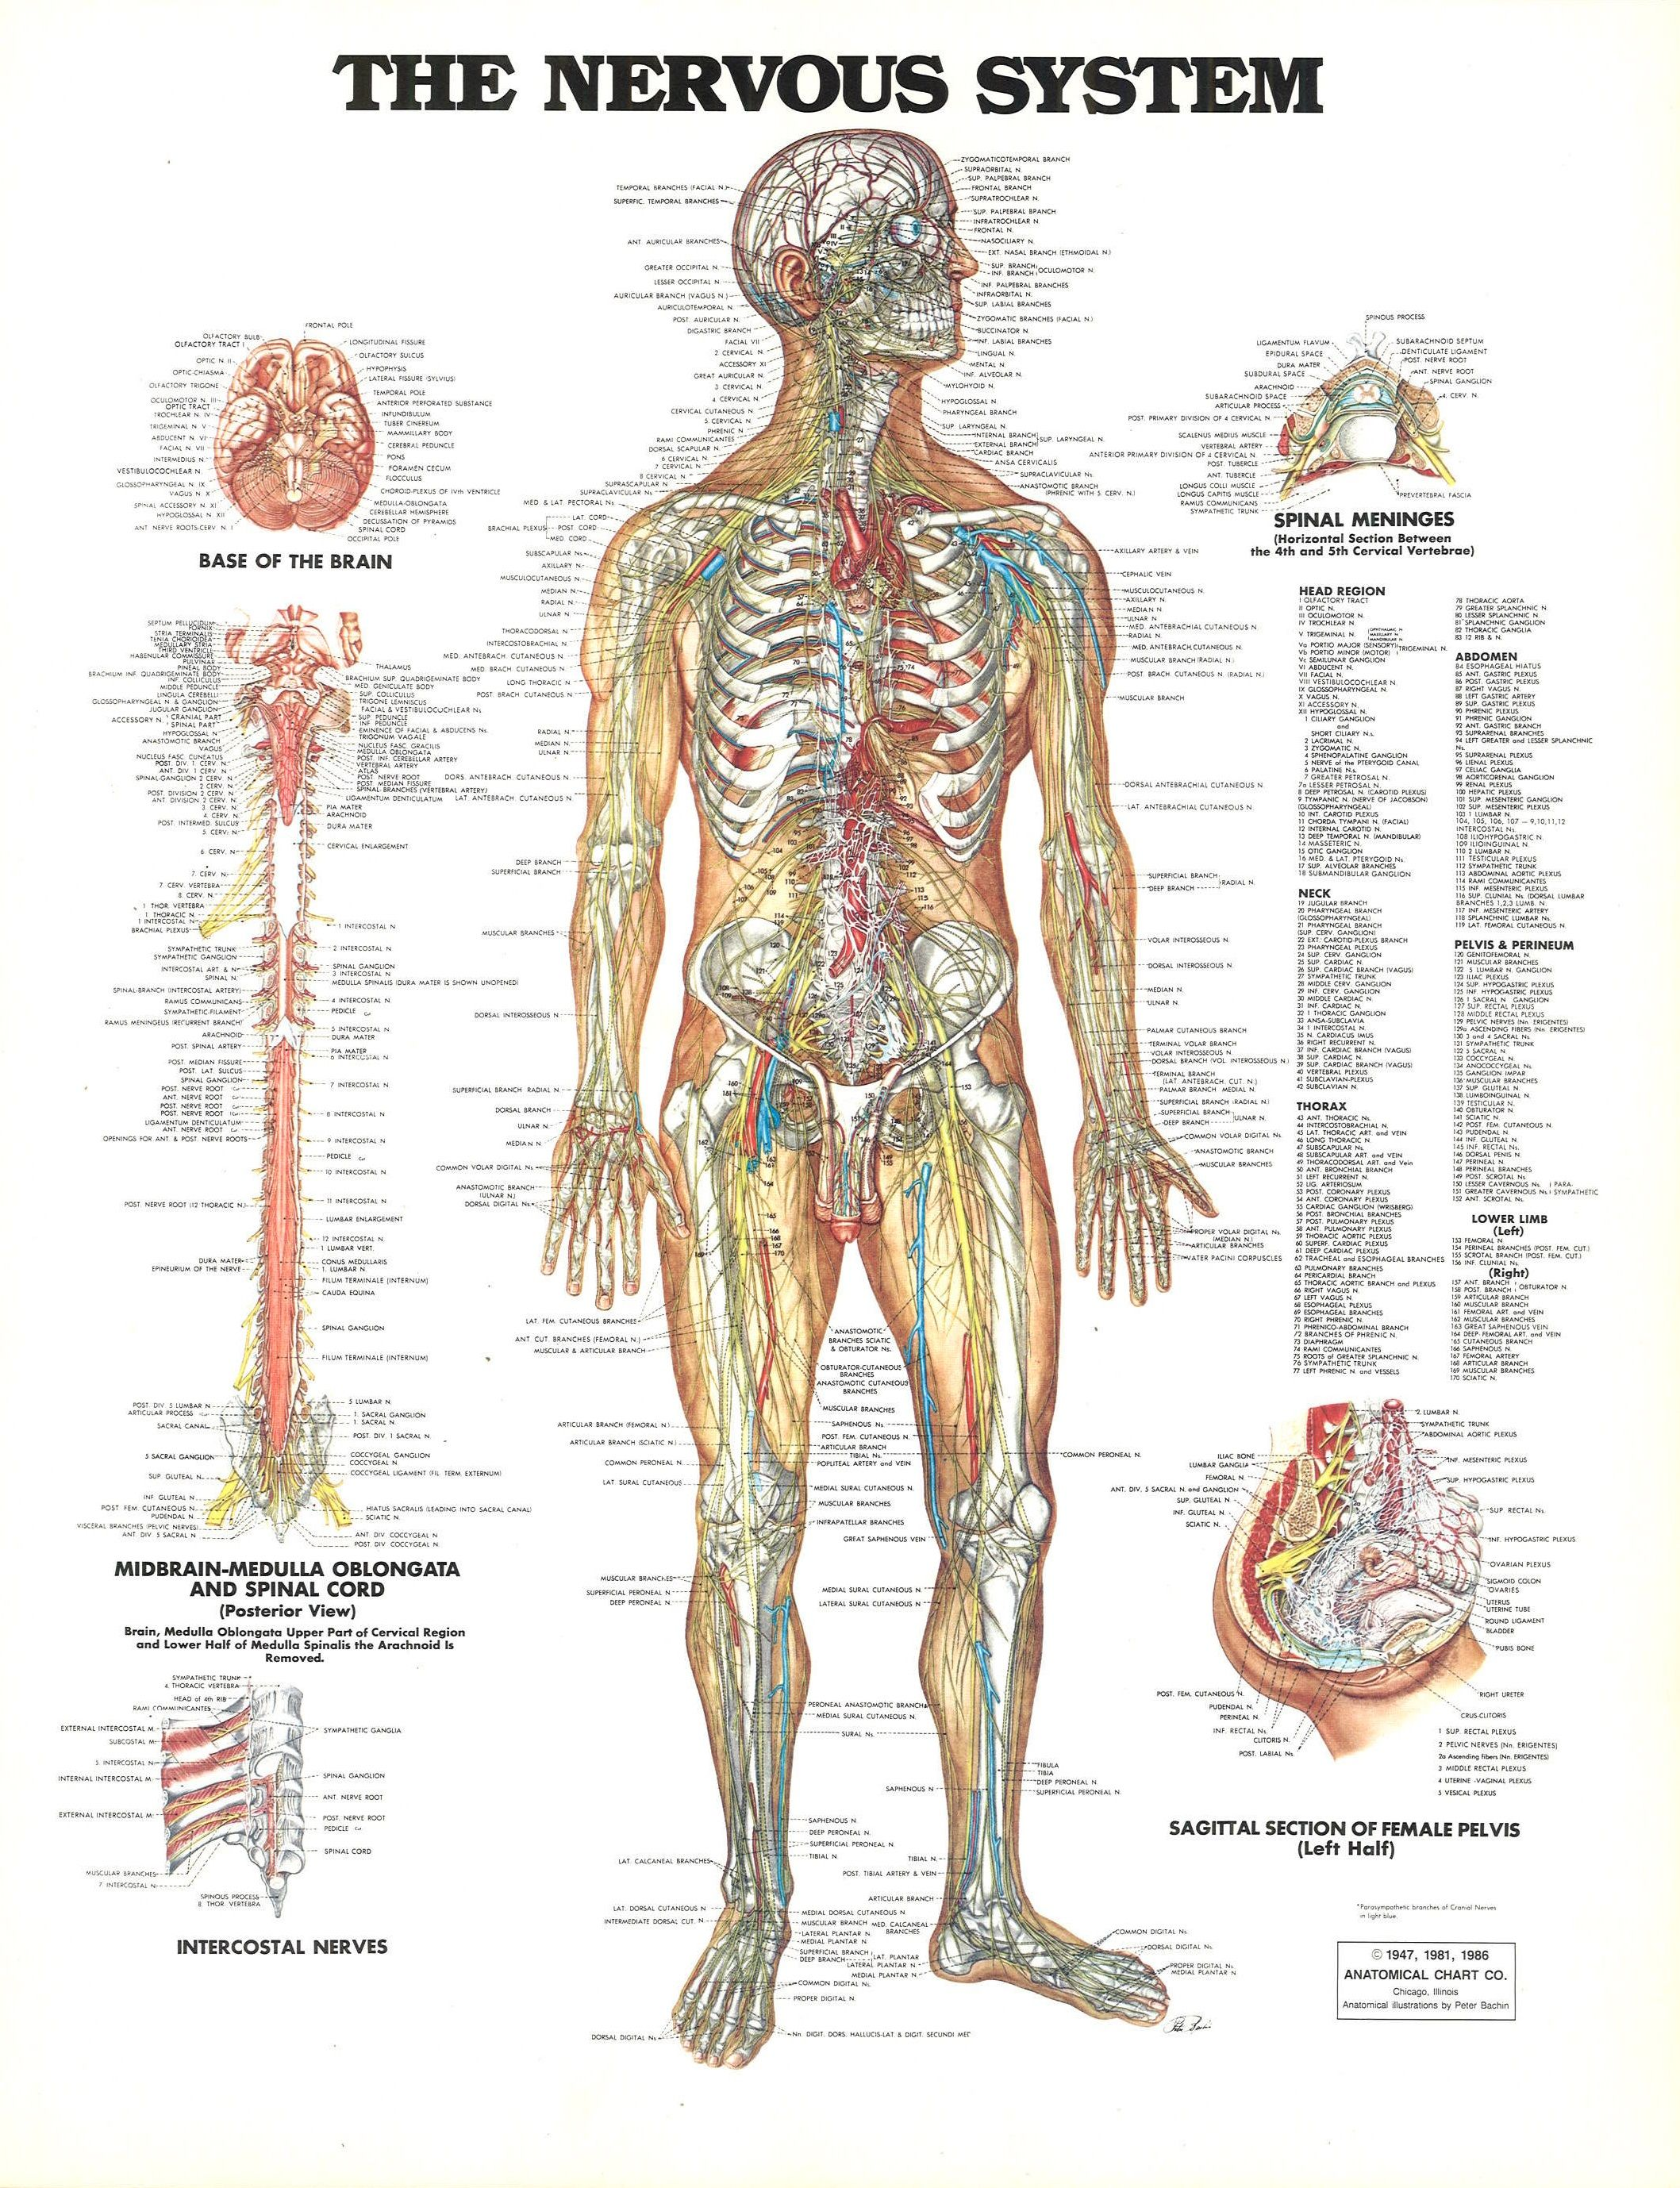 nervous system diagram nervous system anatomy human nervous system nerve anatomy human [ 2117 x 2757 Pixel ]